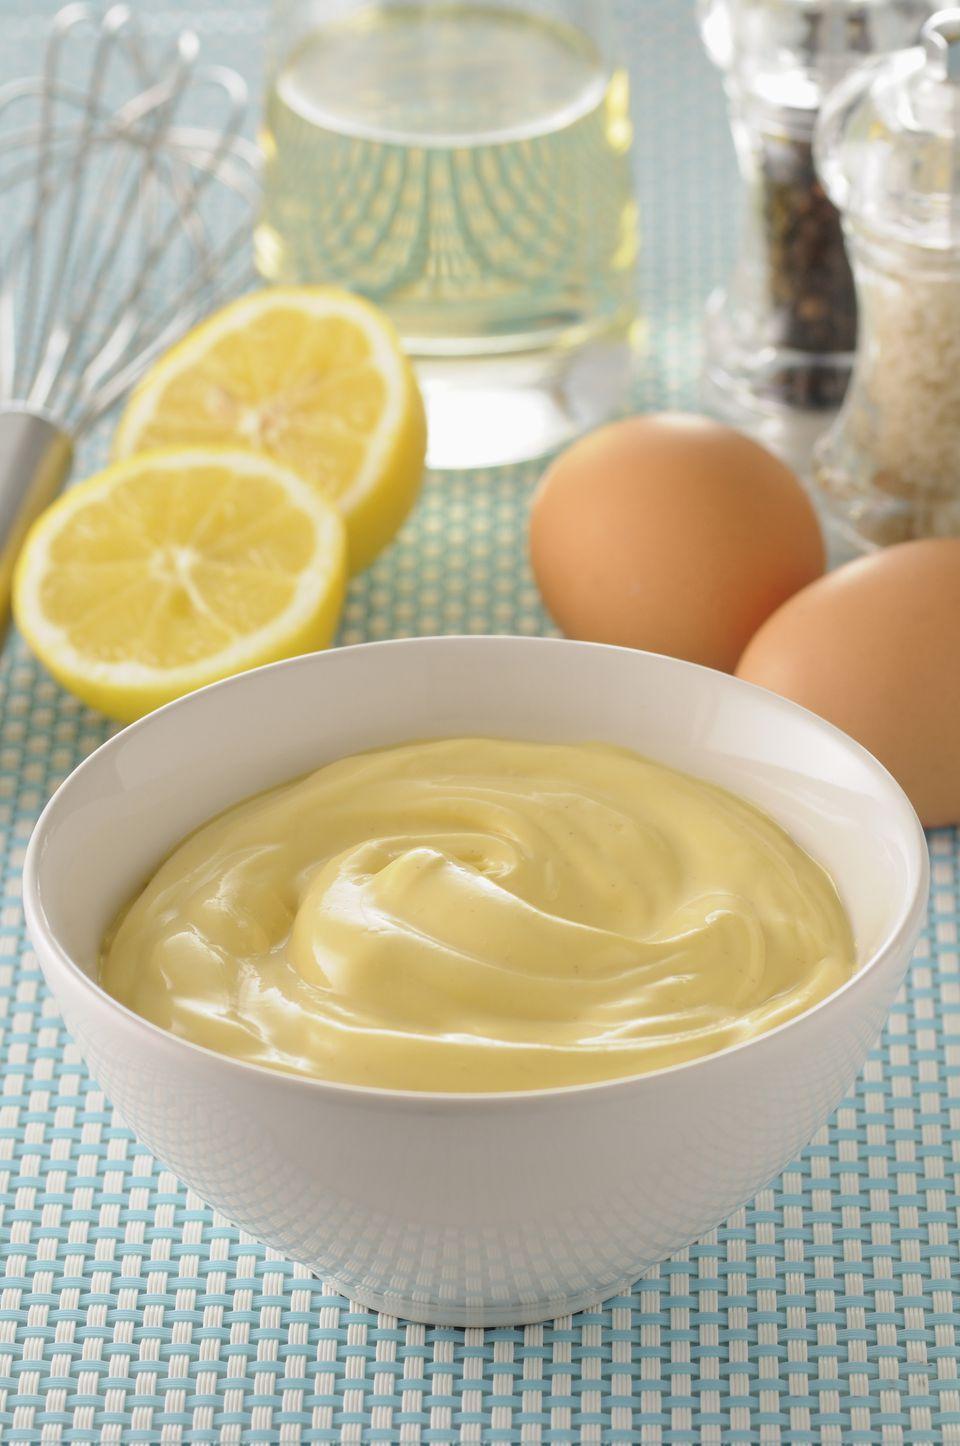 Homemade Gluten-Free Mayonnaise Image